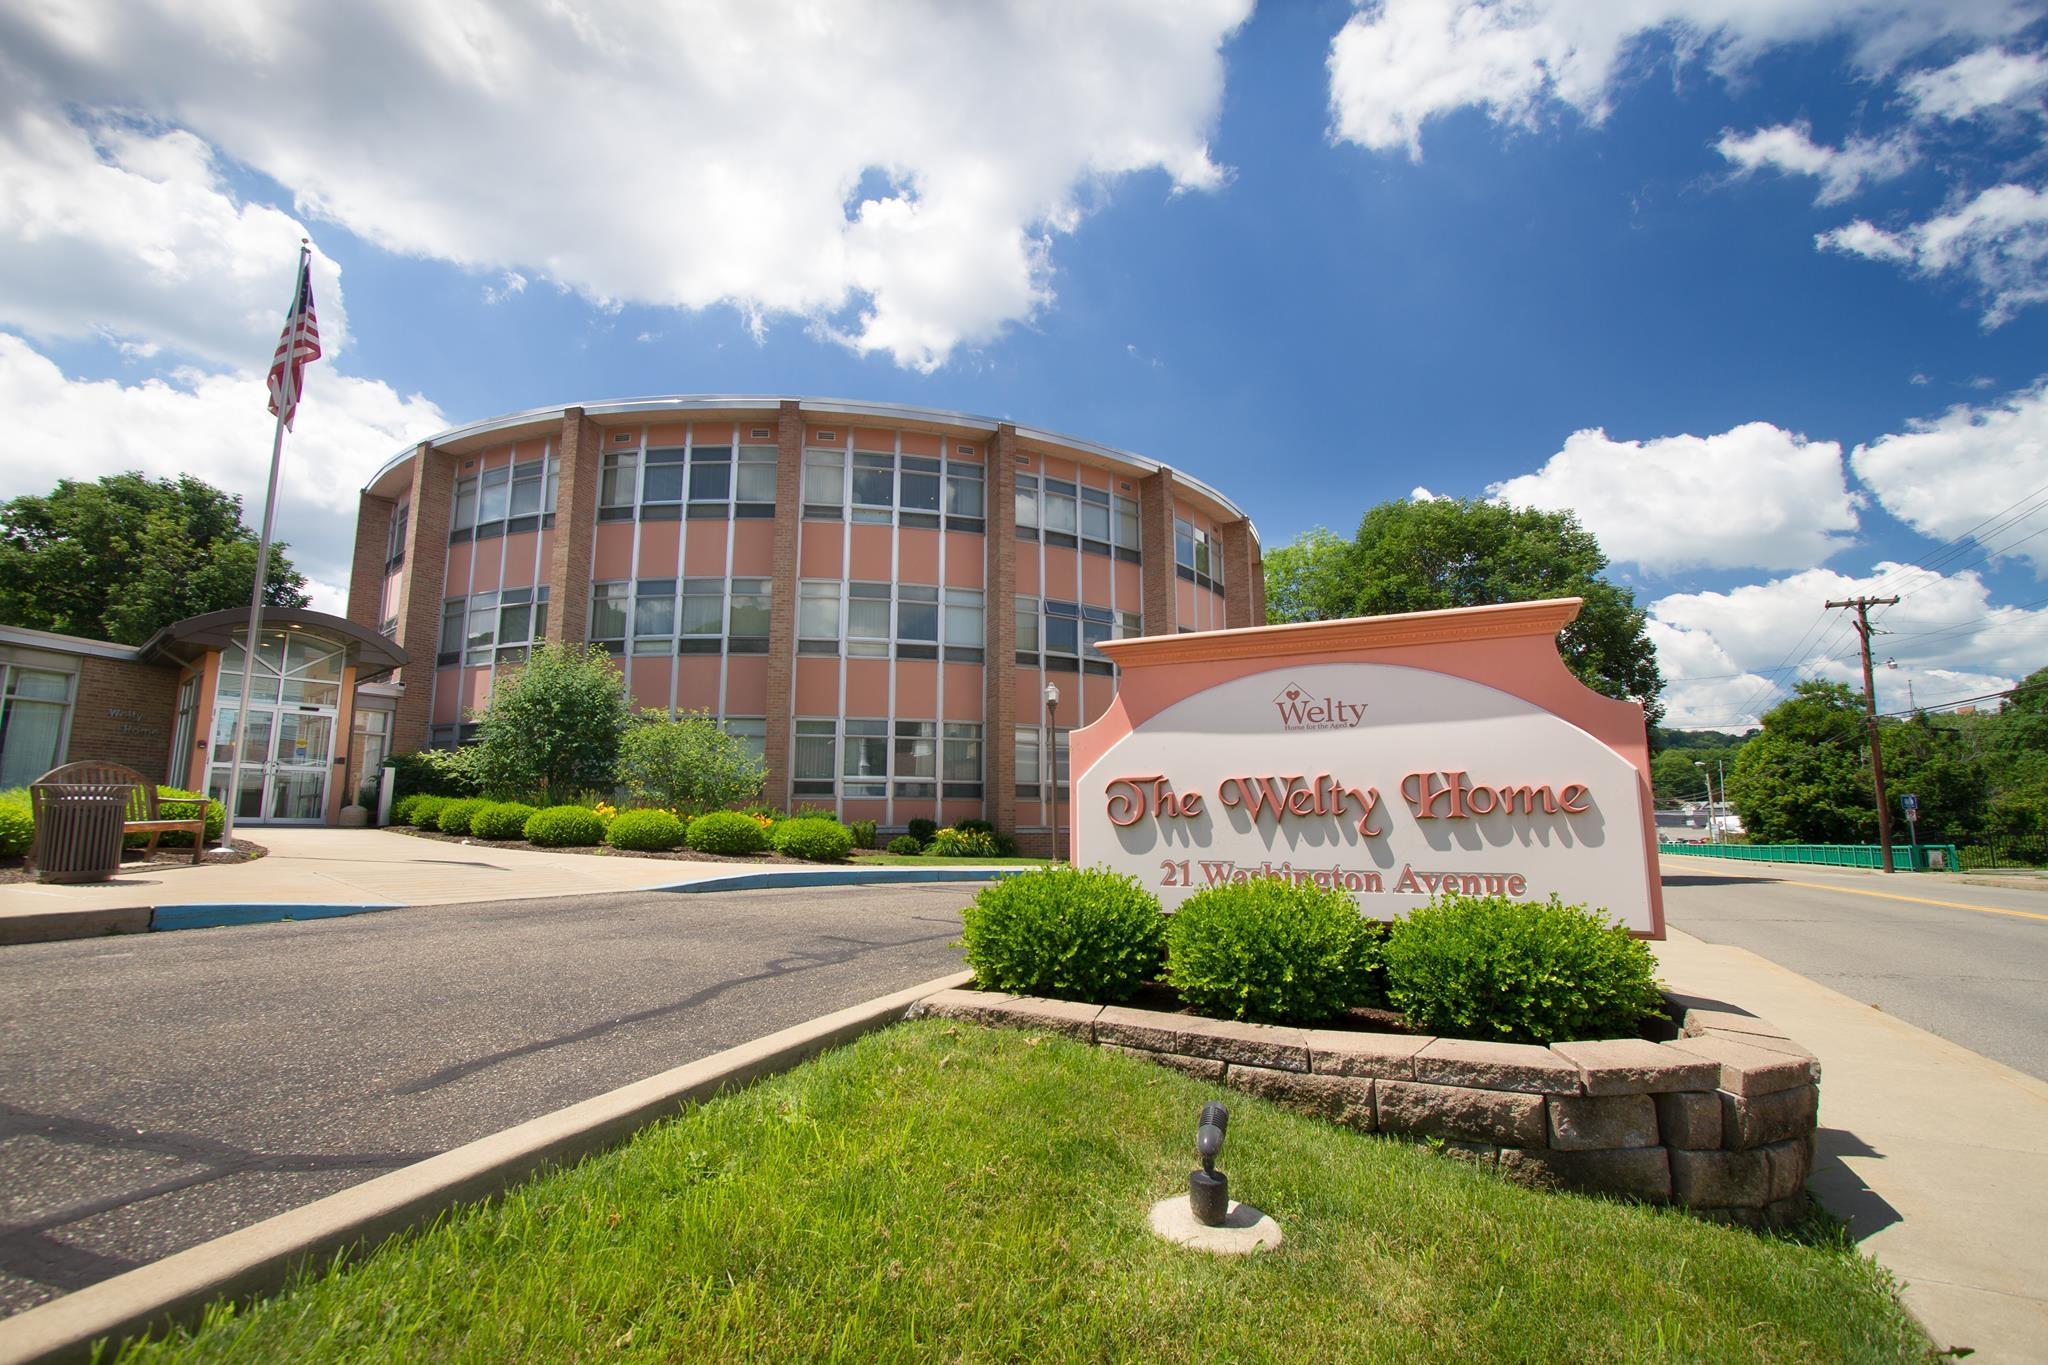 Good Shepherd Nursing Home (@weltyhome) Cover Image